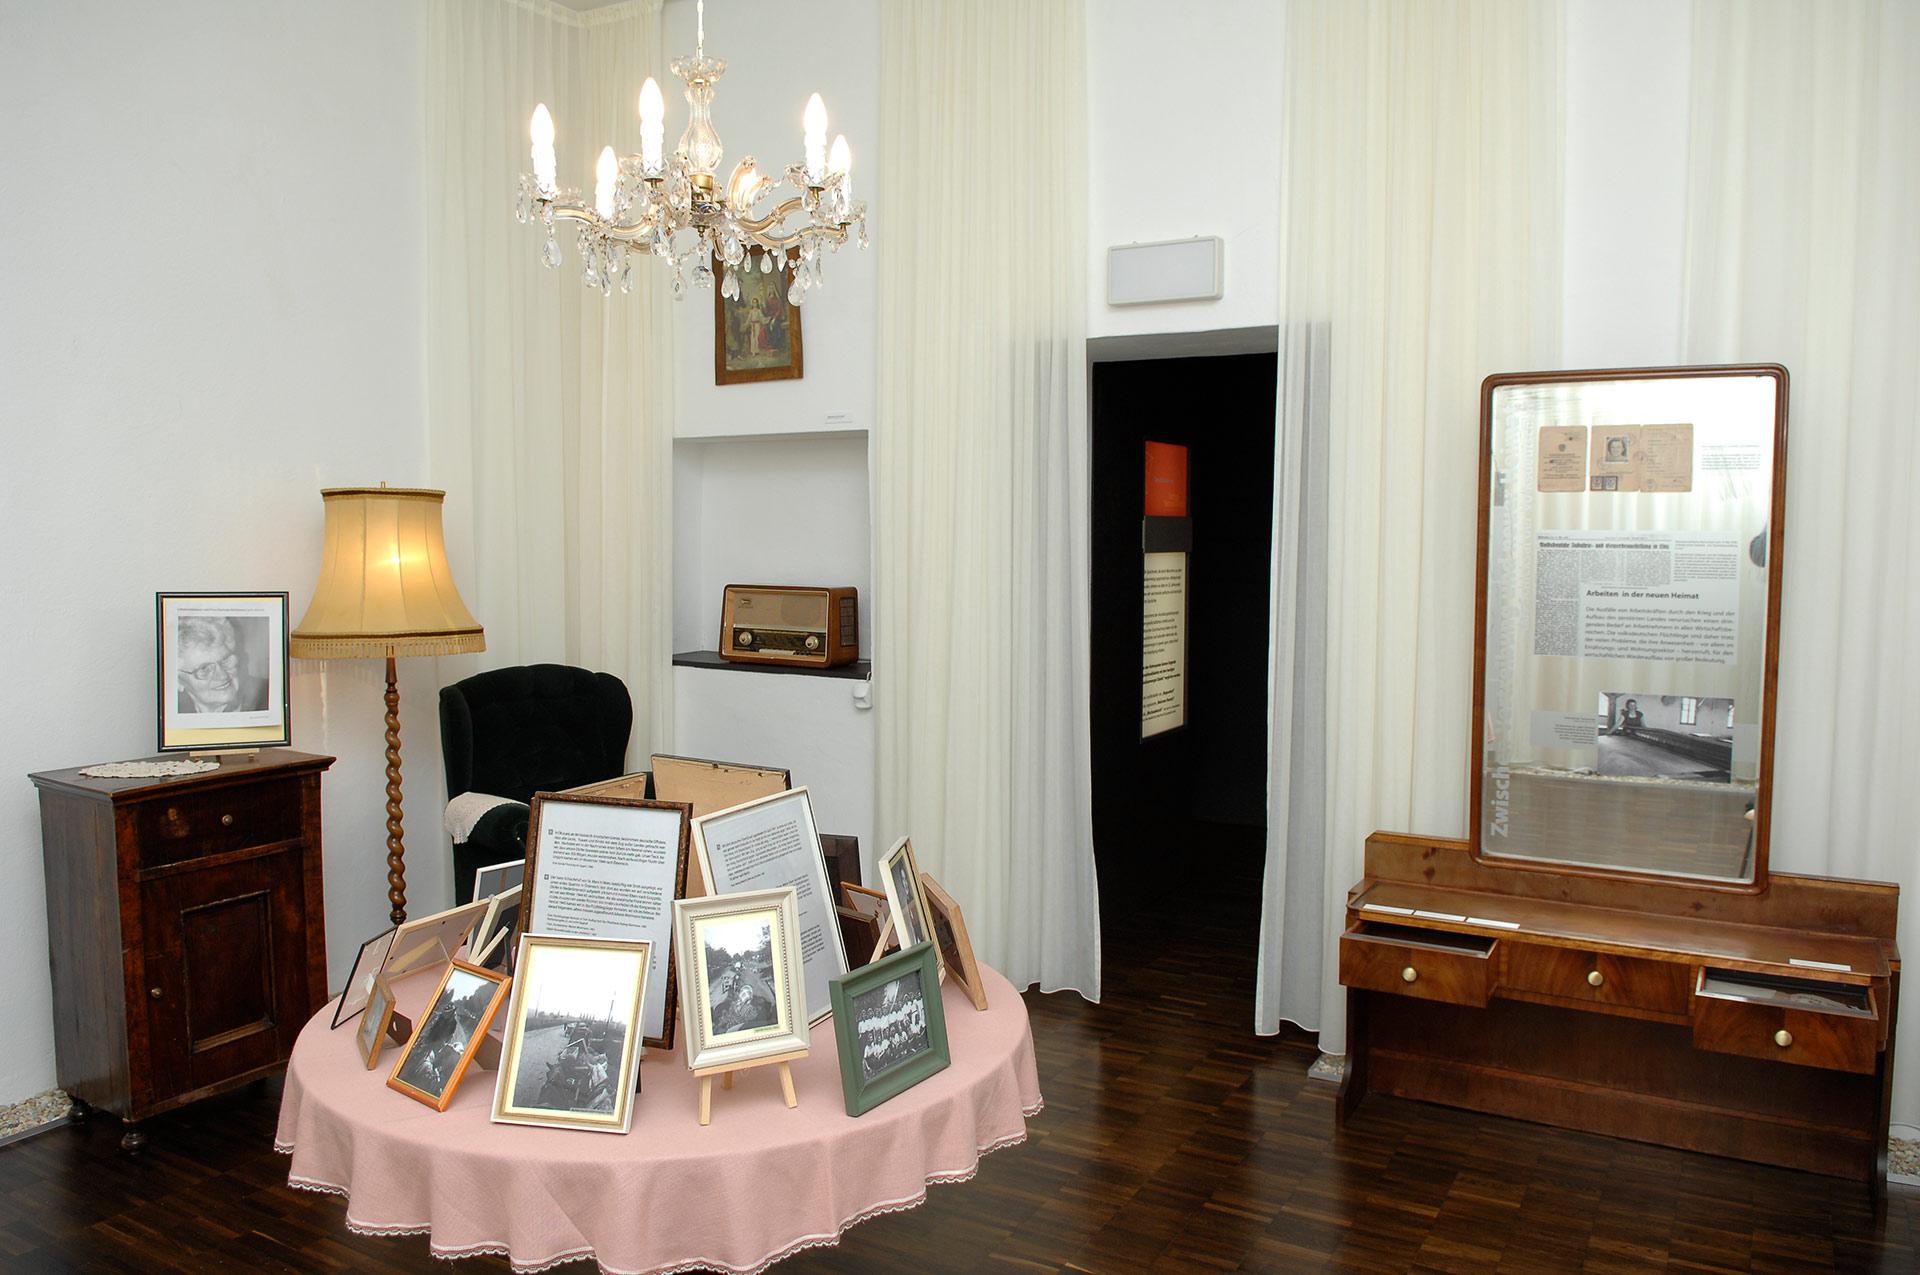 museum_ebensee_vertreibung_101